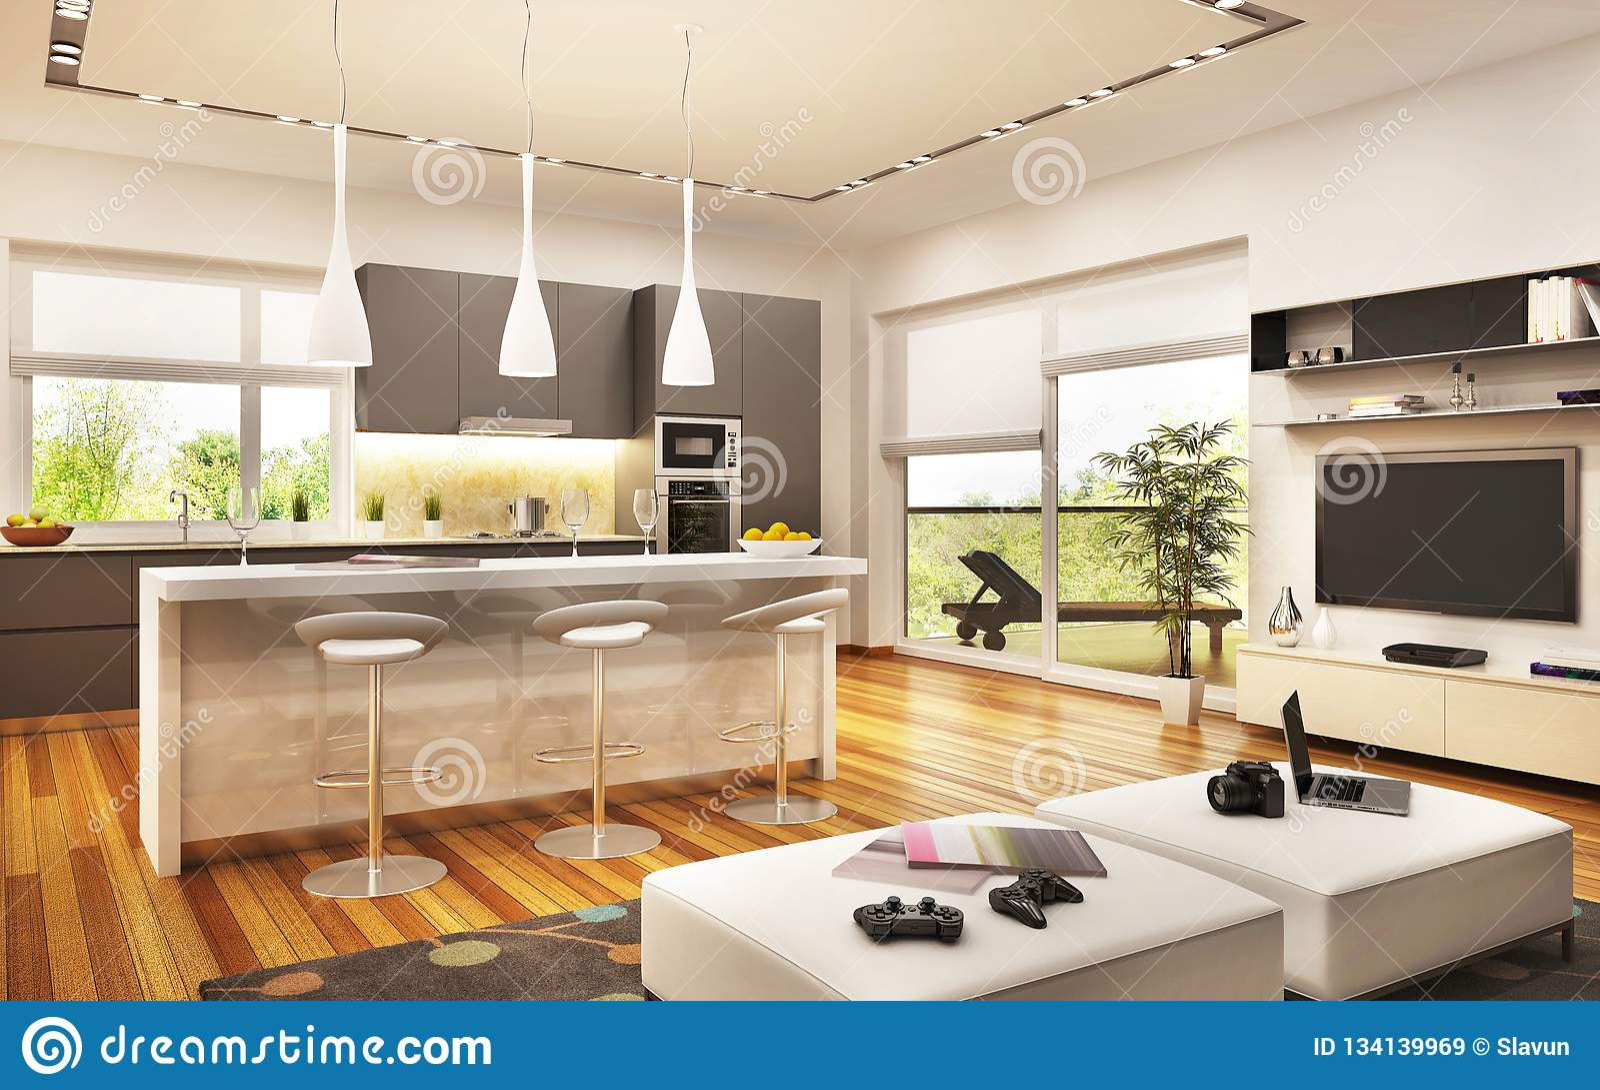 https fr dreamstime com cuisine moderne conception salon image134139969